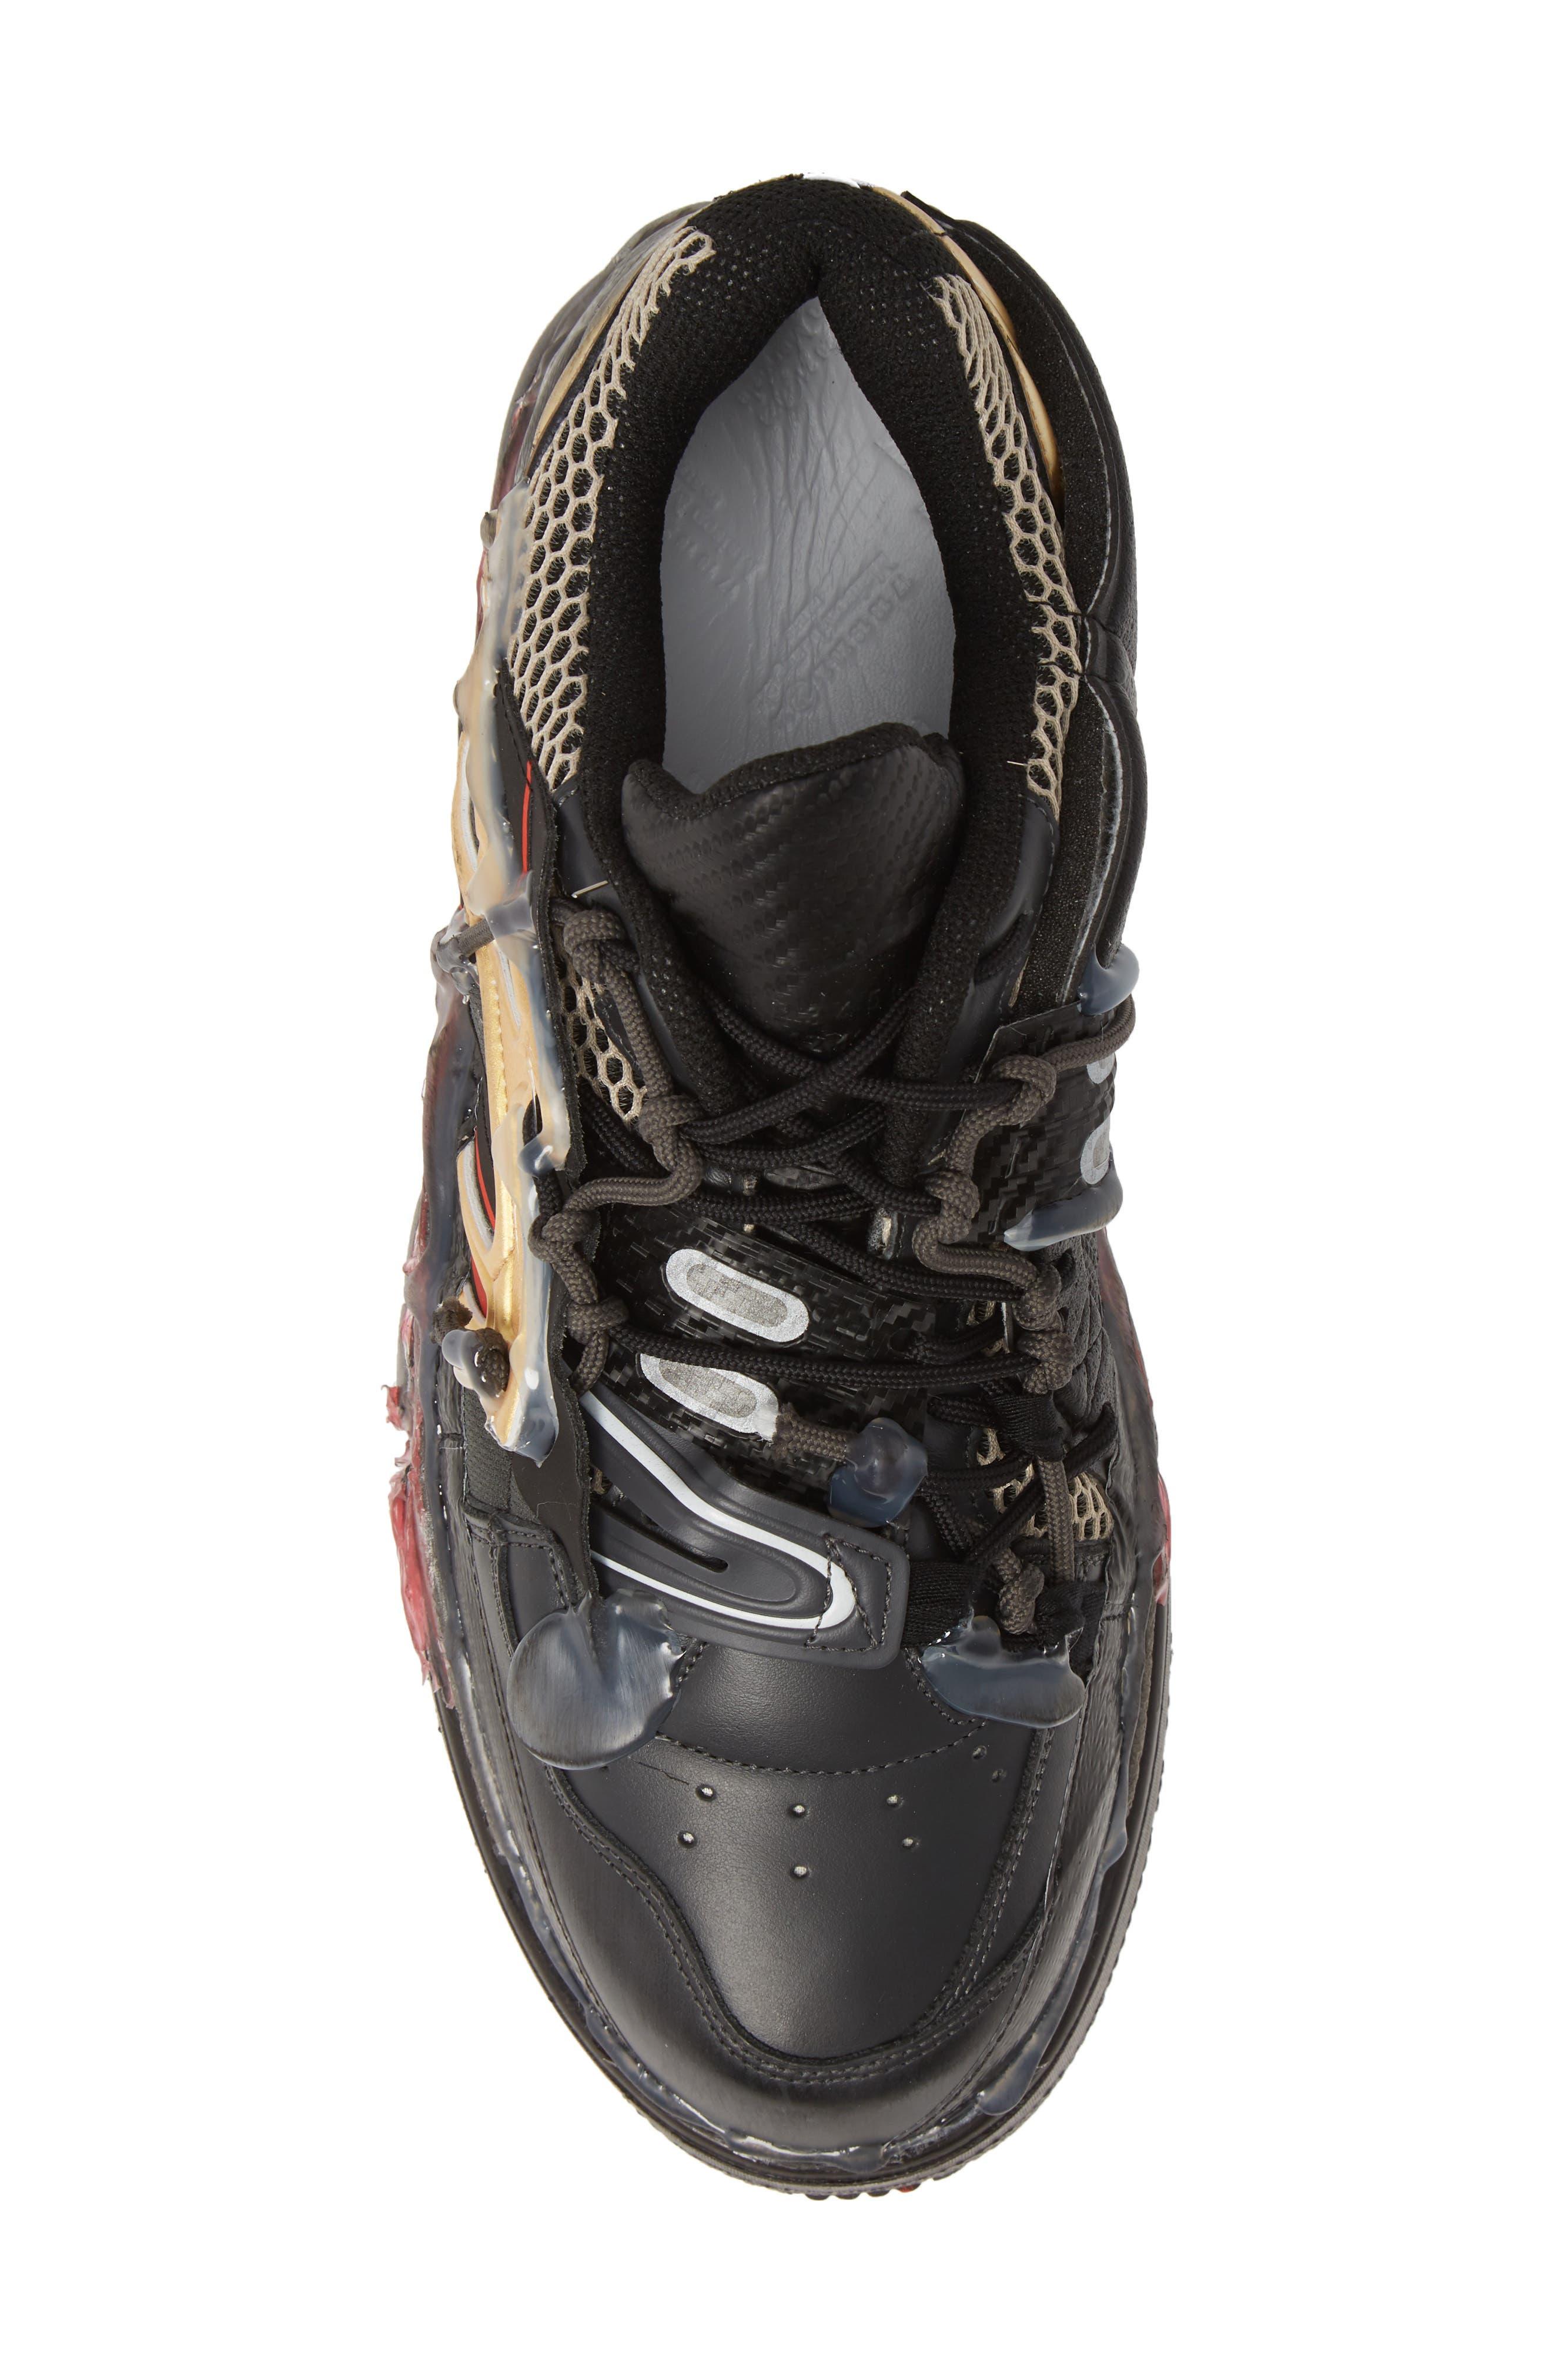 MM6 MAISON MARGIELA,                             Maison Margiela Fusion Sneaker,                             Alternate thumbnail 5, color,                             BLACK/ GOLD/ RED